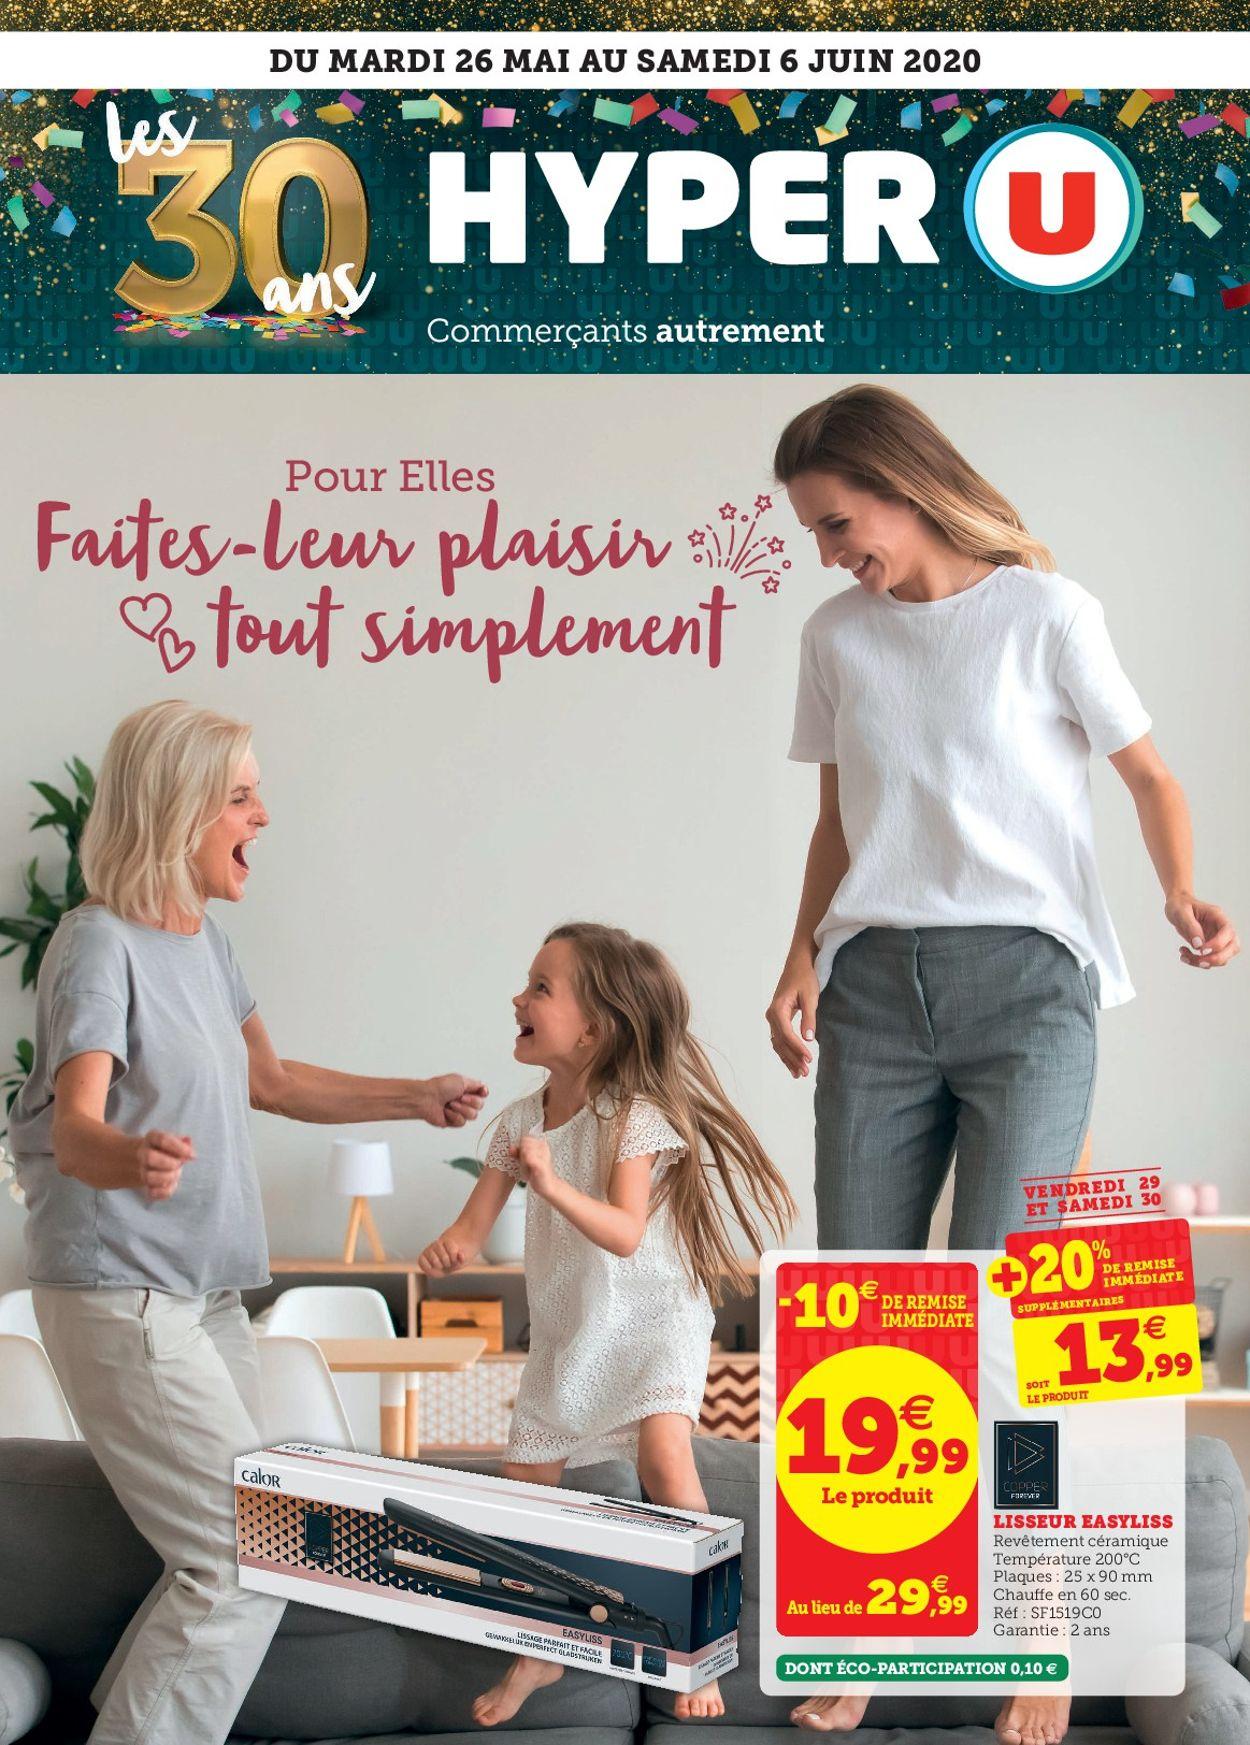 Magasins U Catalogue - 26.05-06.06.2020